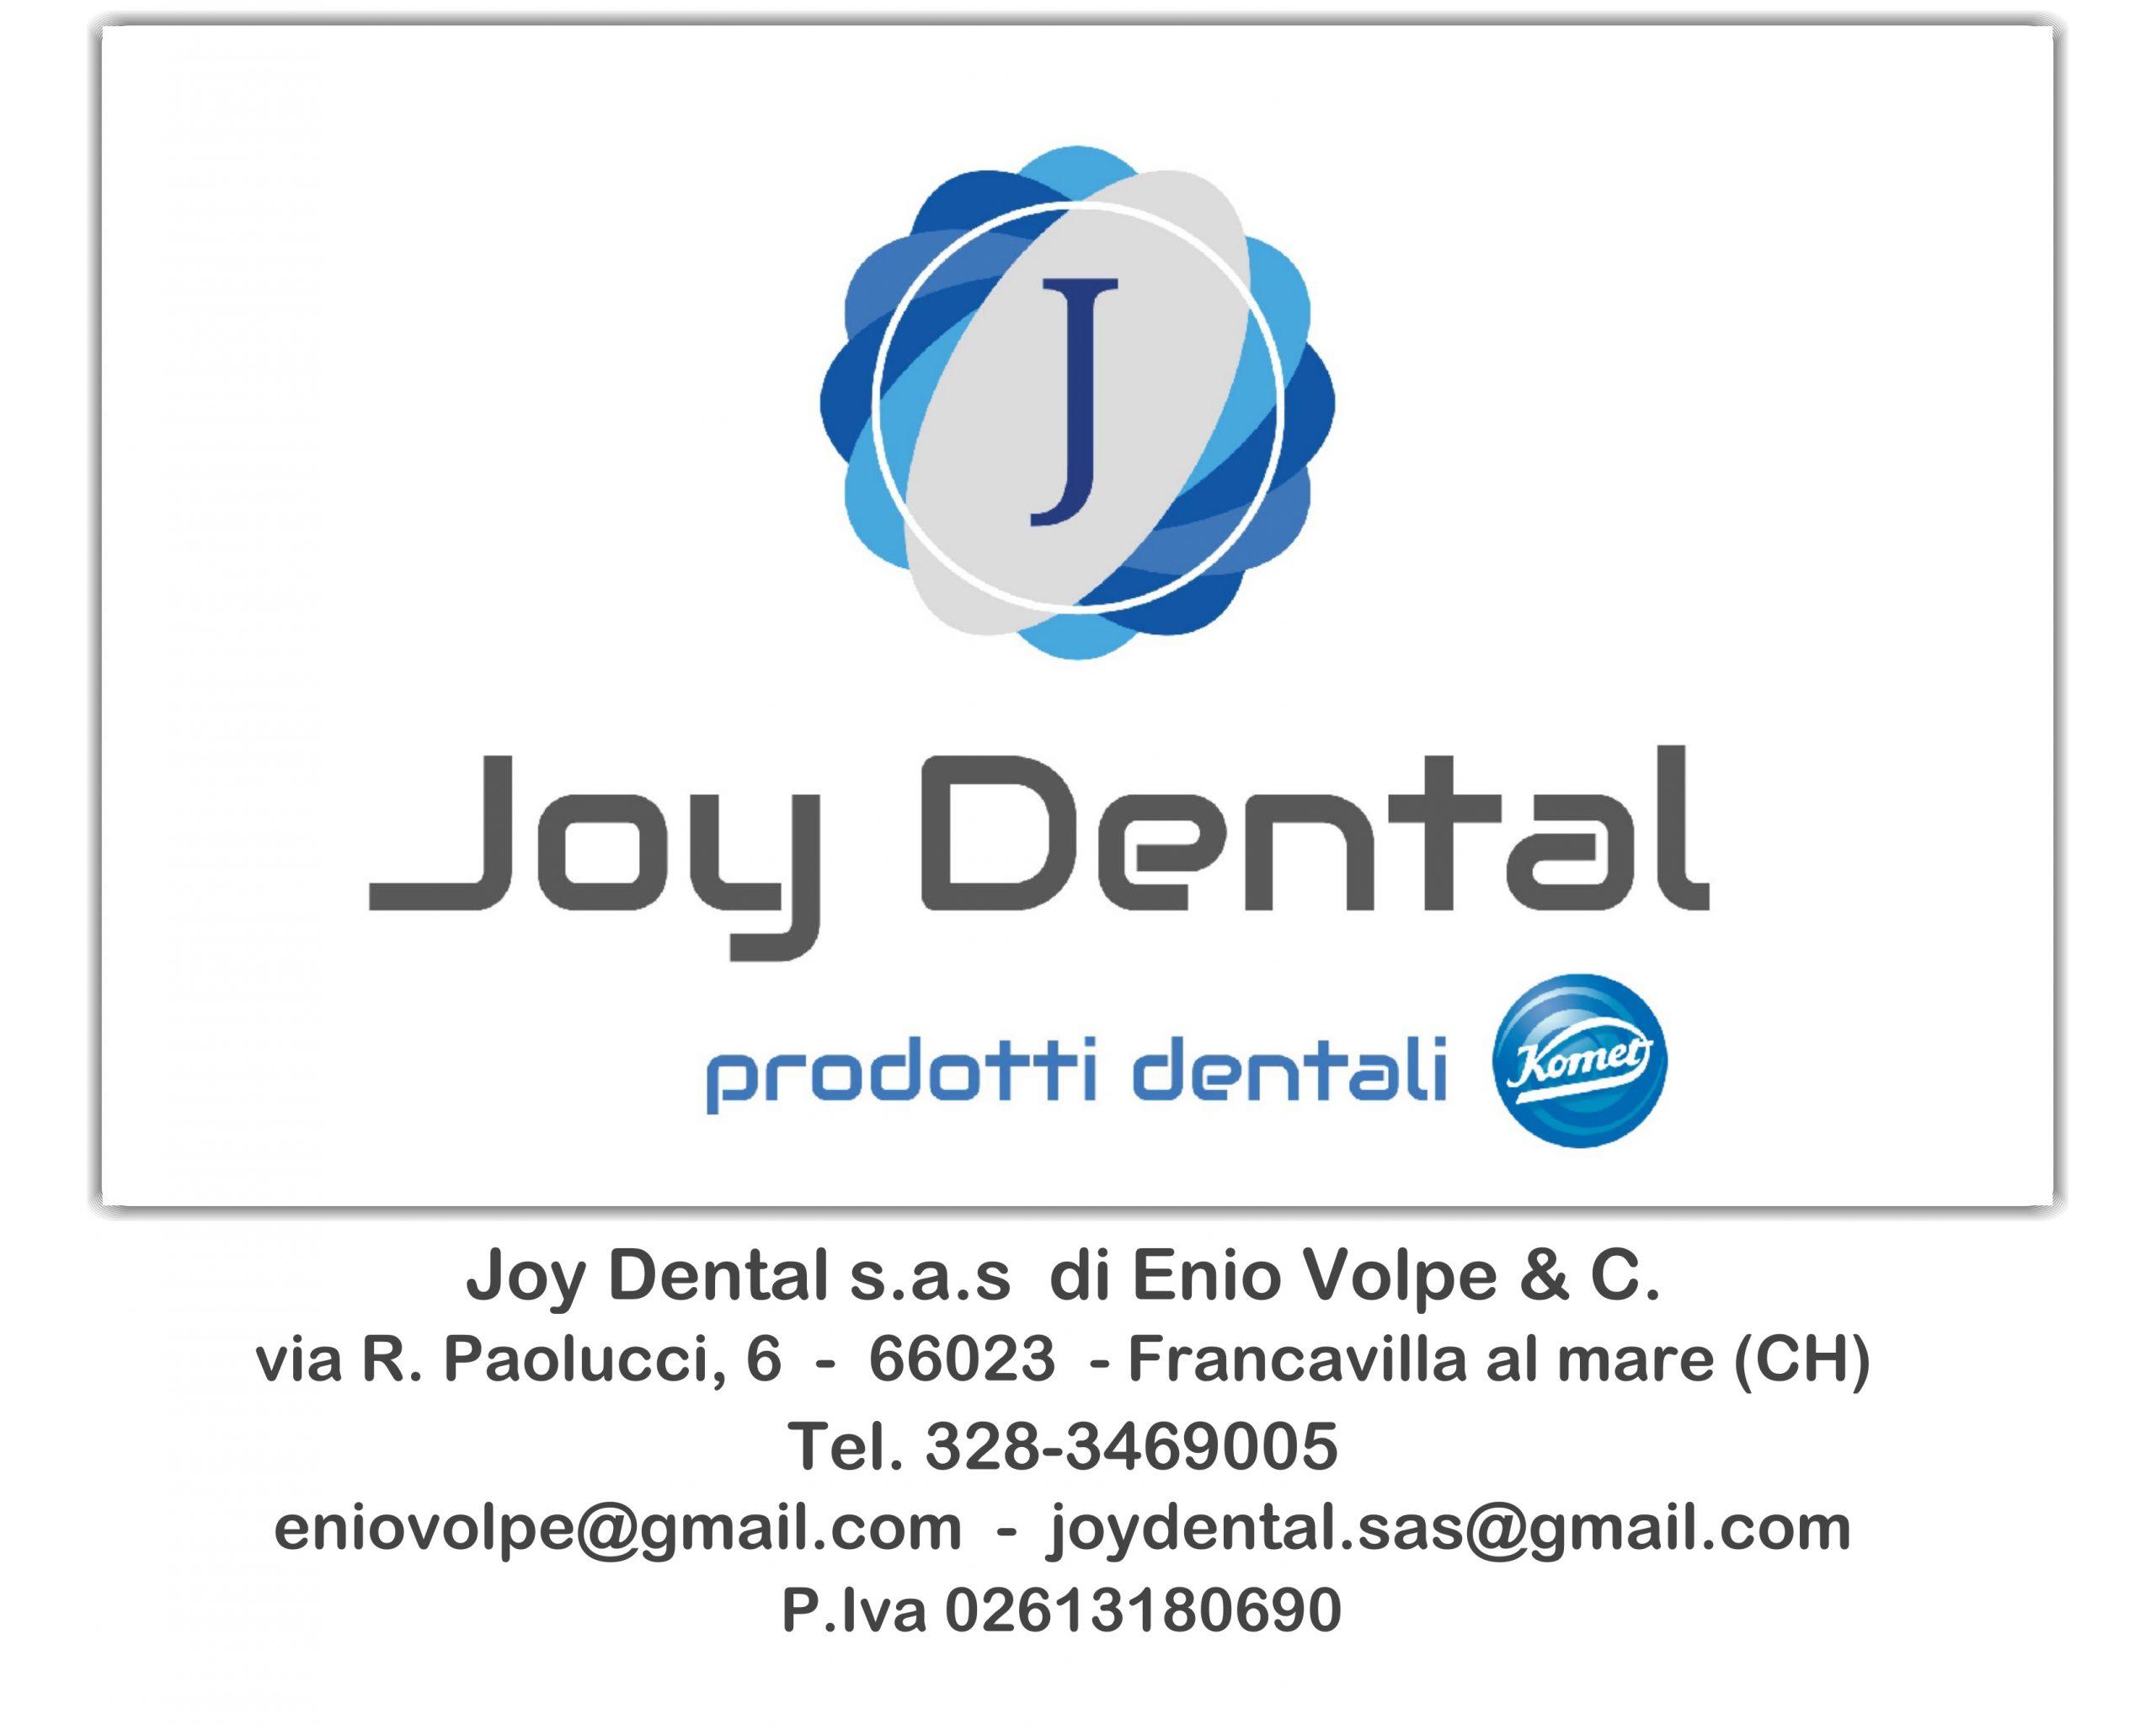 Joy-Dental-Logo-Completo-2.jpg